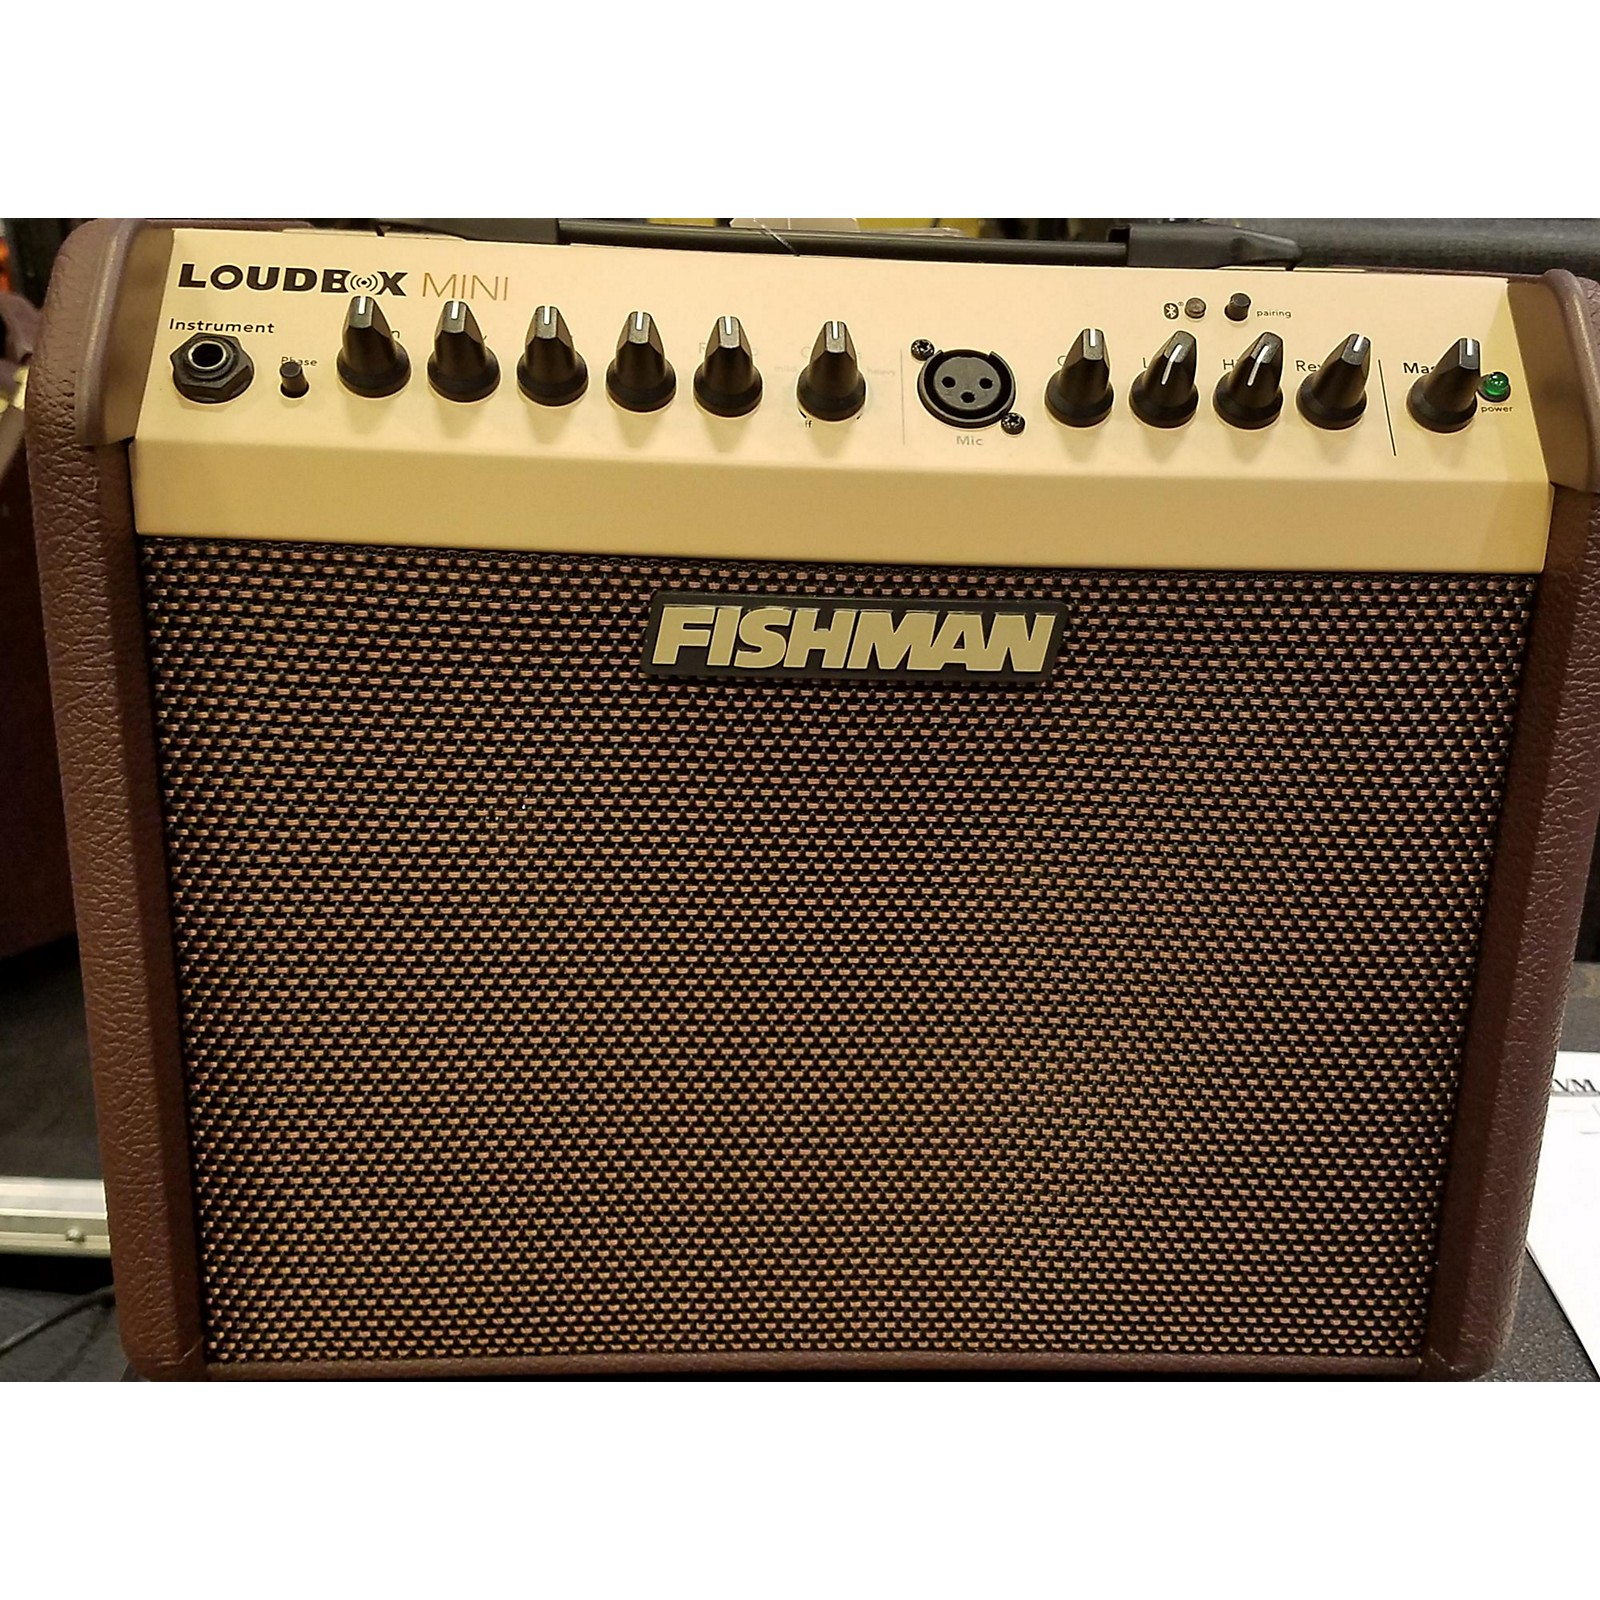 Fishman 2010s PROLBX500 Loudbox Mini Acoustic Guitar Combo Amp